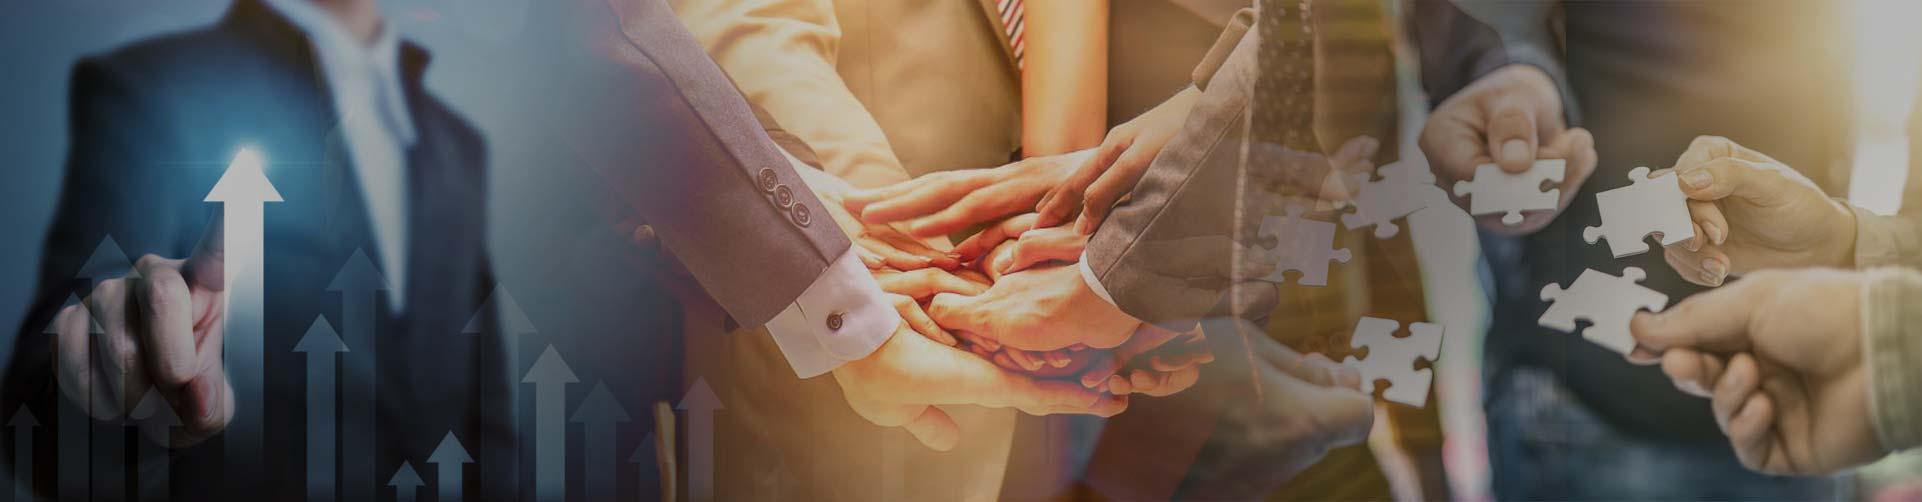 MBA in Entrepreneurship and Family Business Management